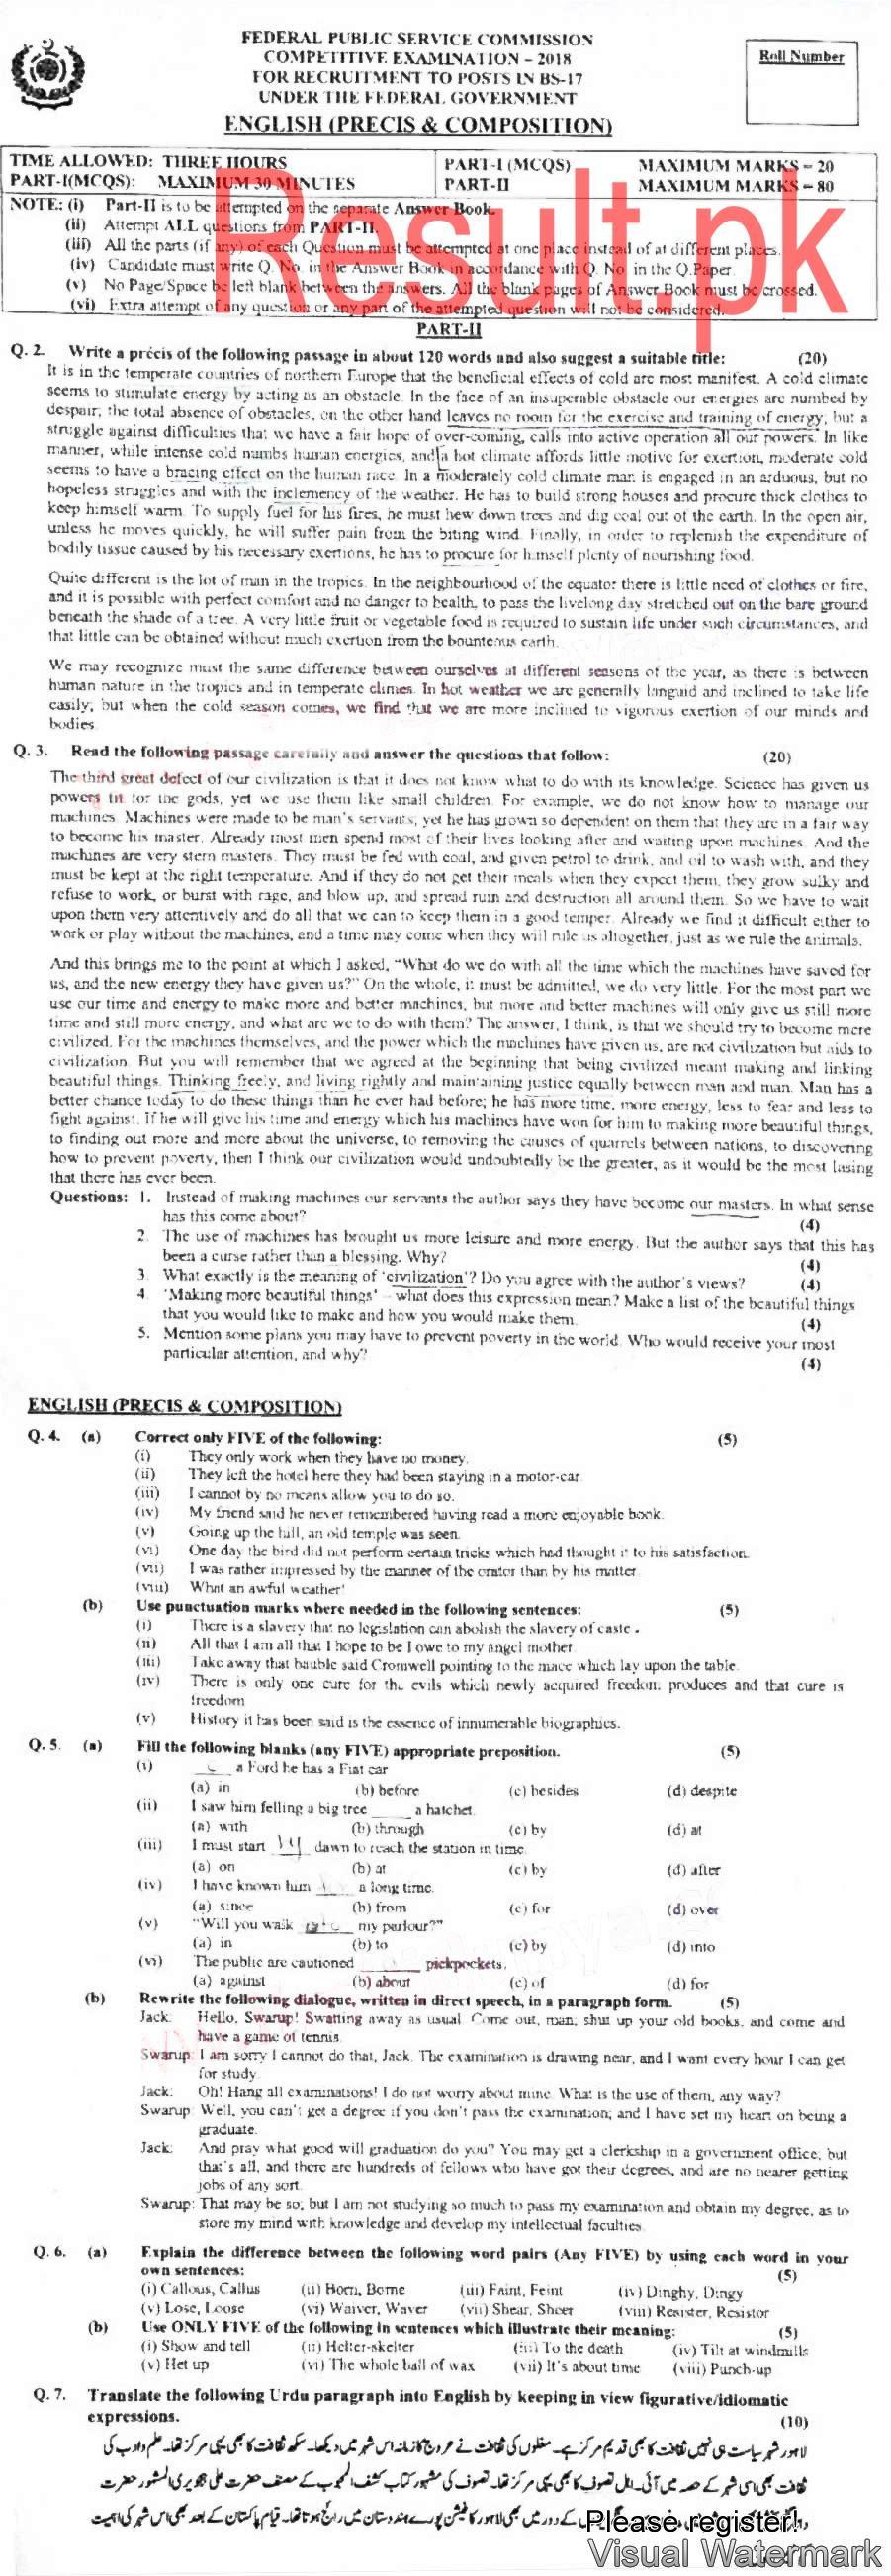 Federal Public Service Commission Past Papers 2019, fpsc